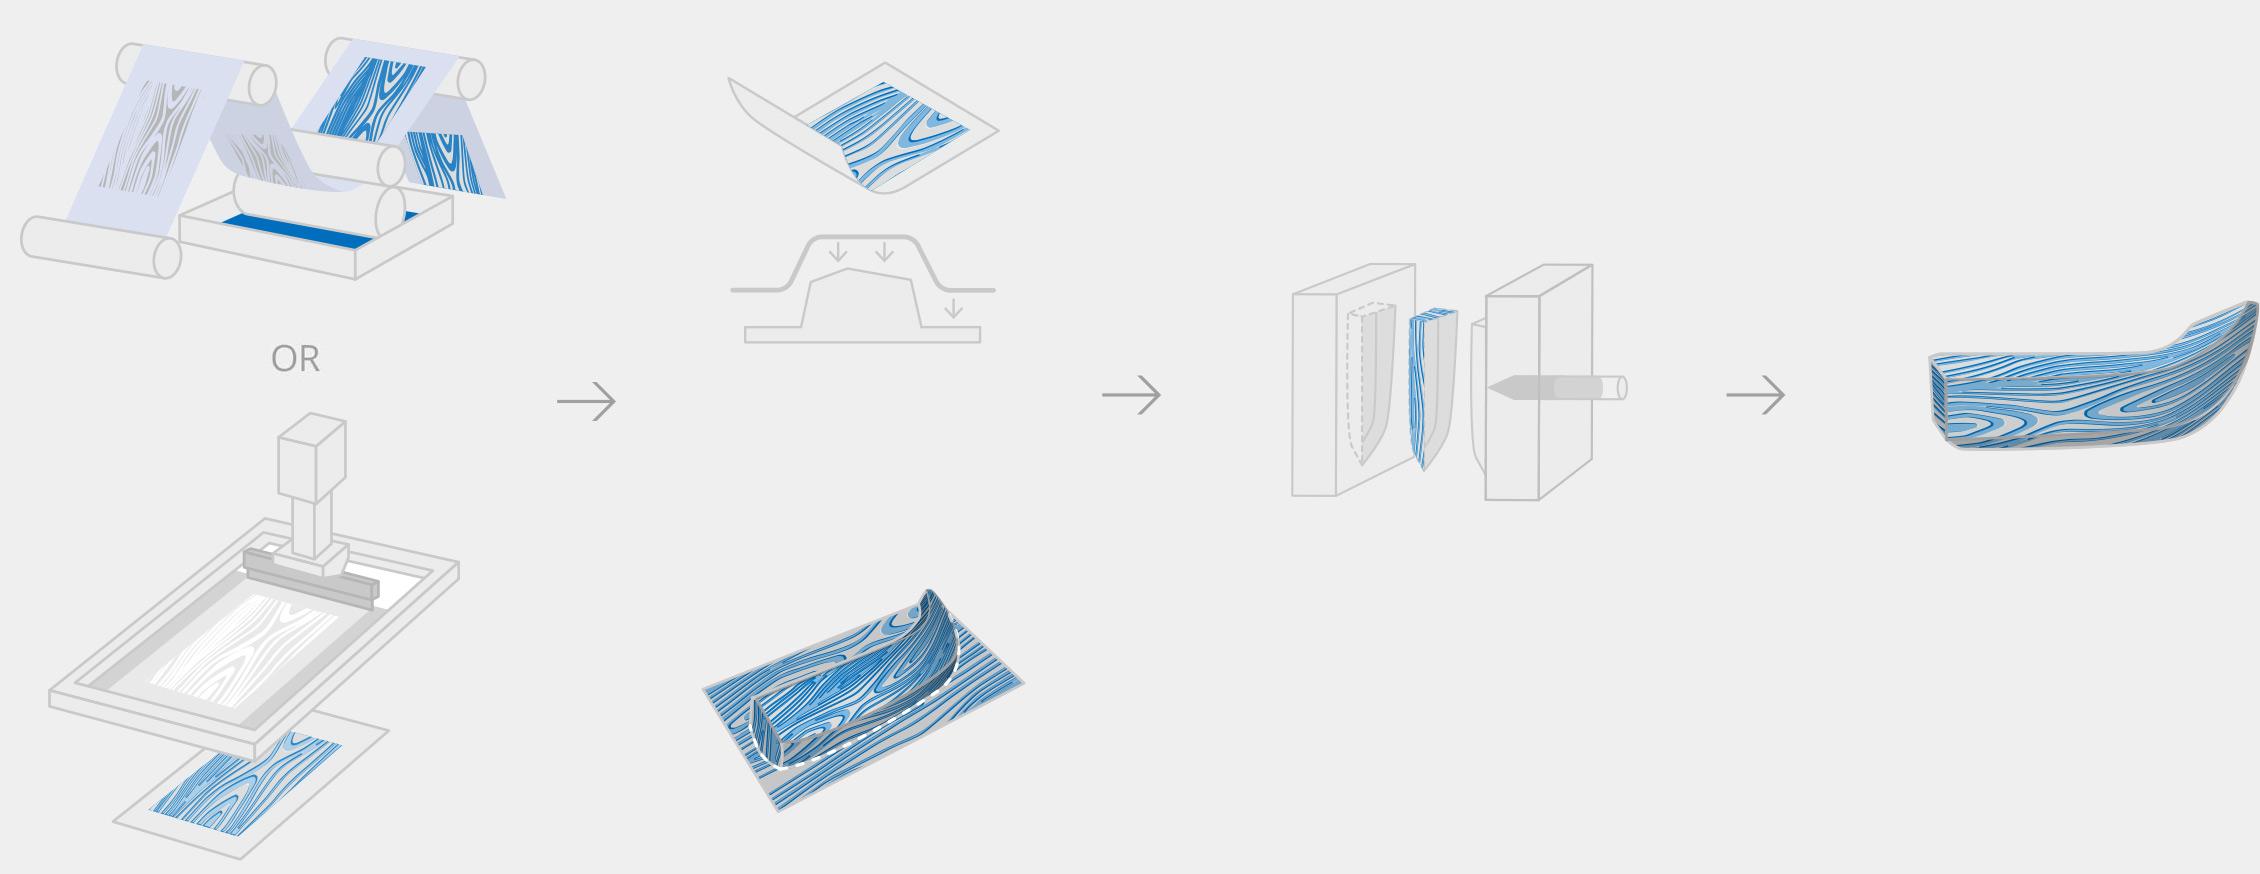 Process Flow scheme